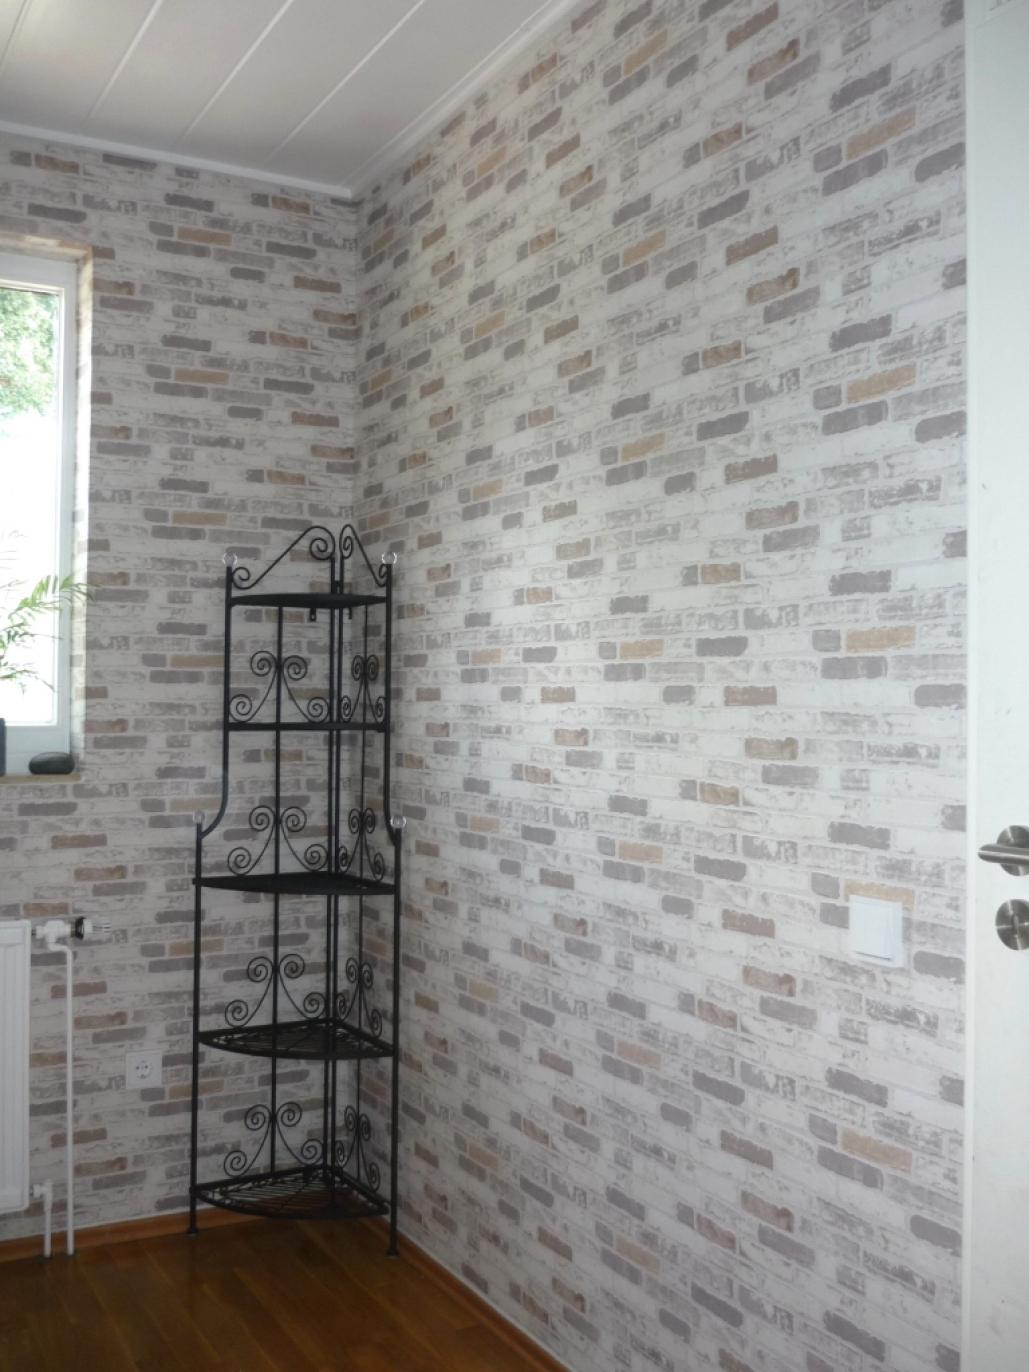 Spannende Wand Ohne Tapete Wandgestaltung Ohne Tapete